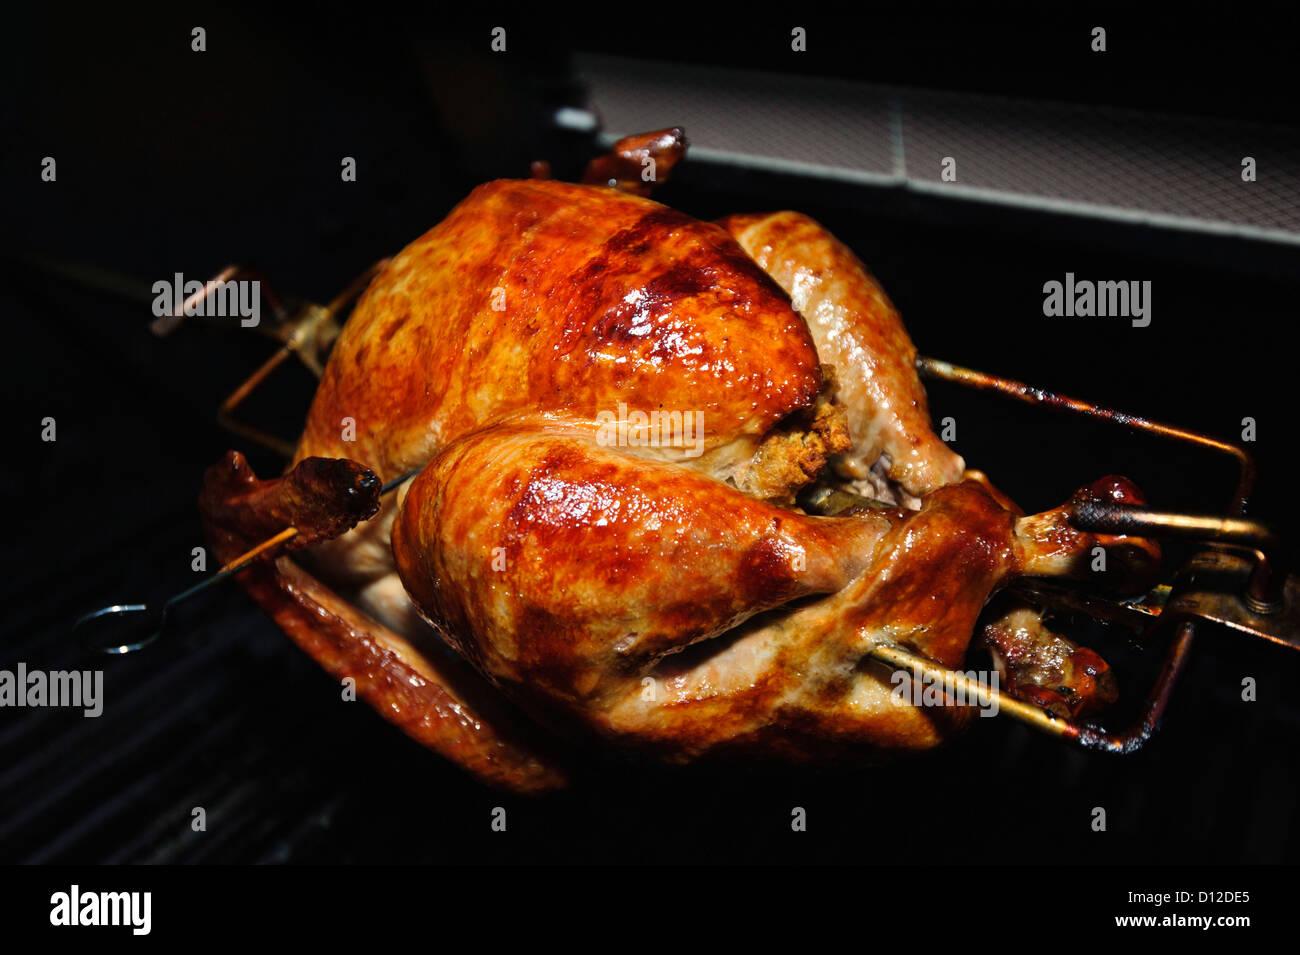 Thanksgiving Turkey Cooked Stockfotos & Thanksgiving Turkey Cooked ...